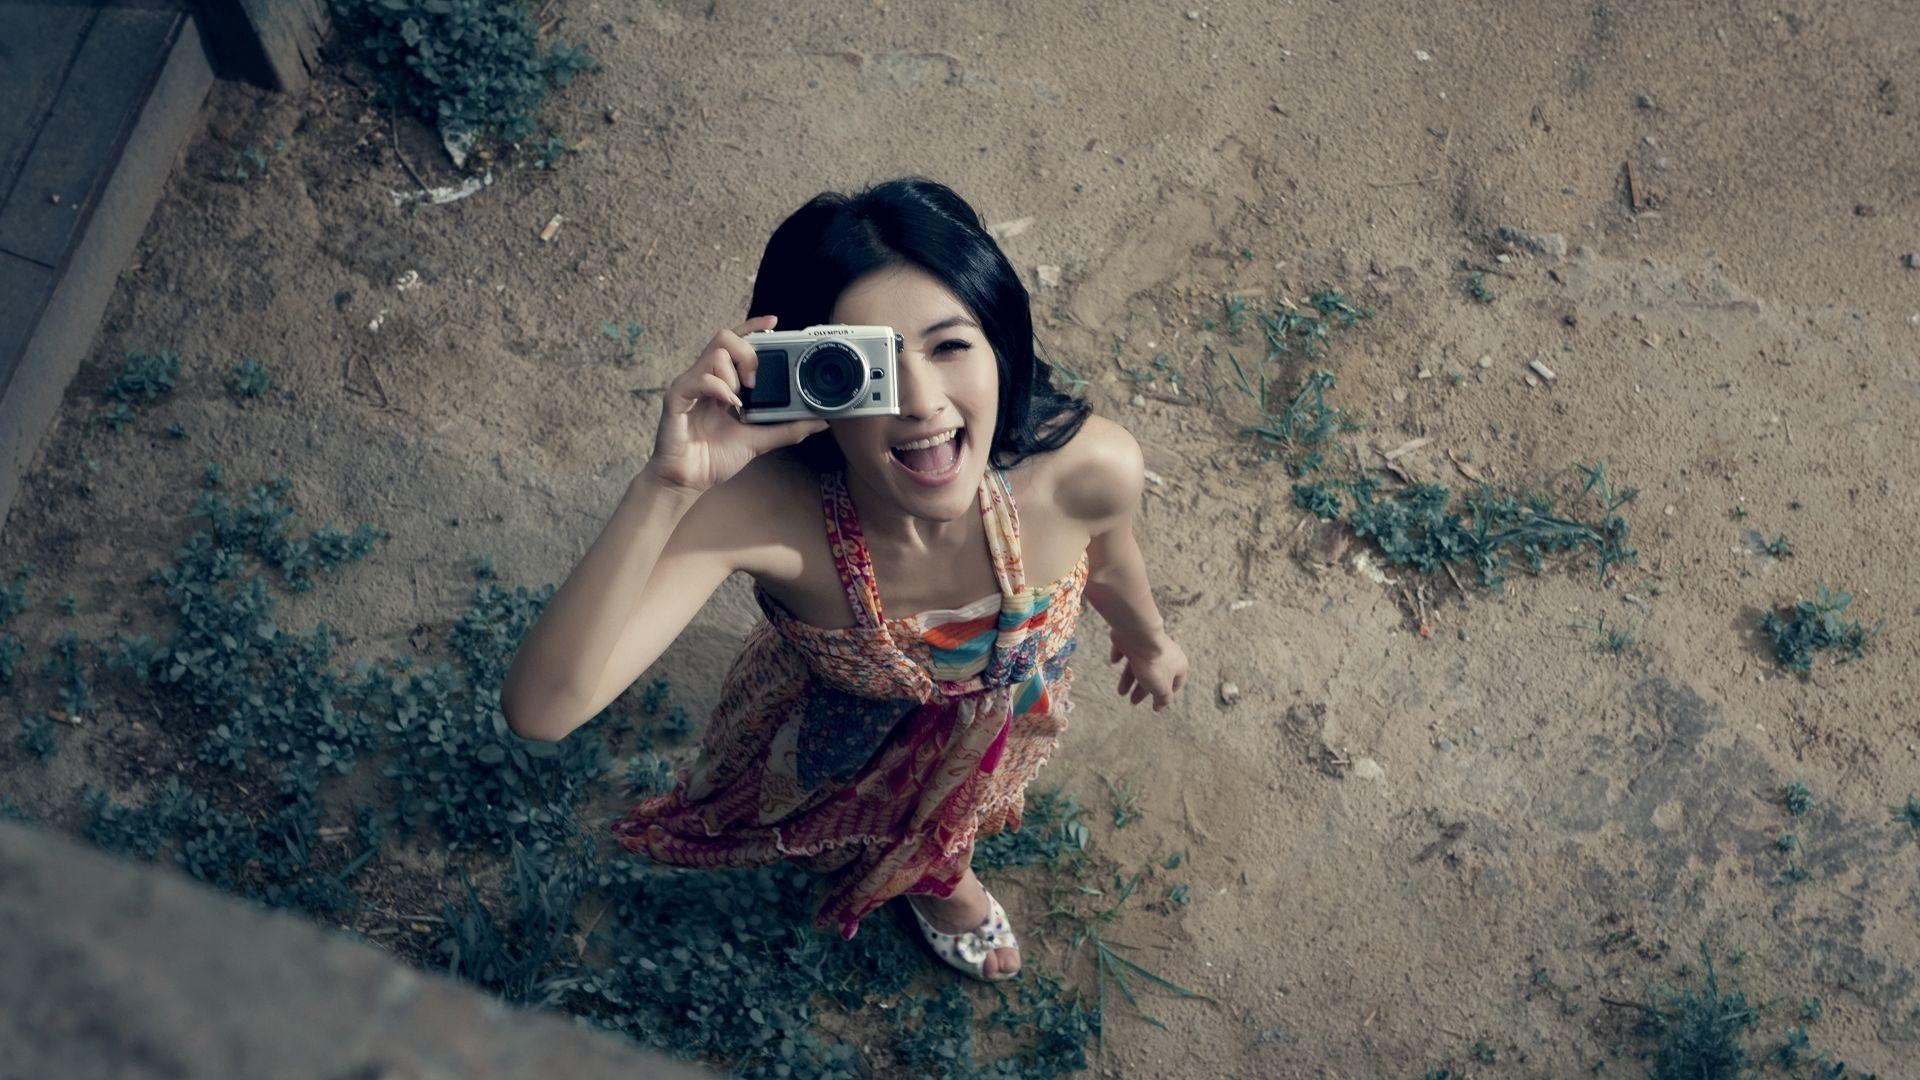 Азиатка камеру